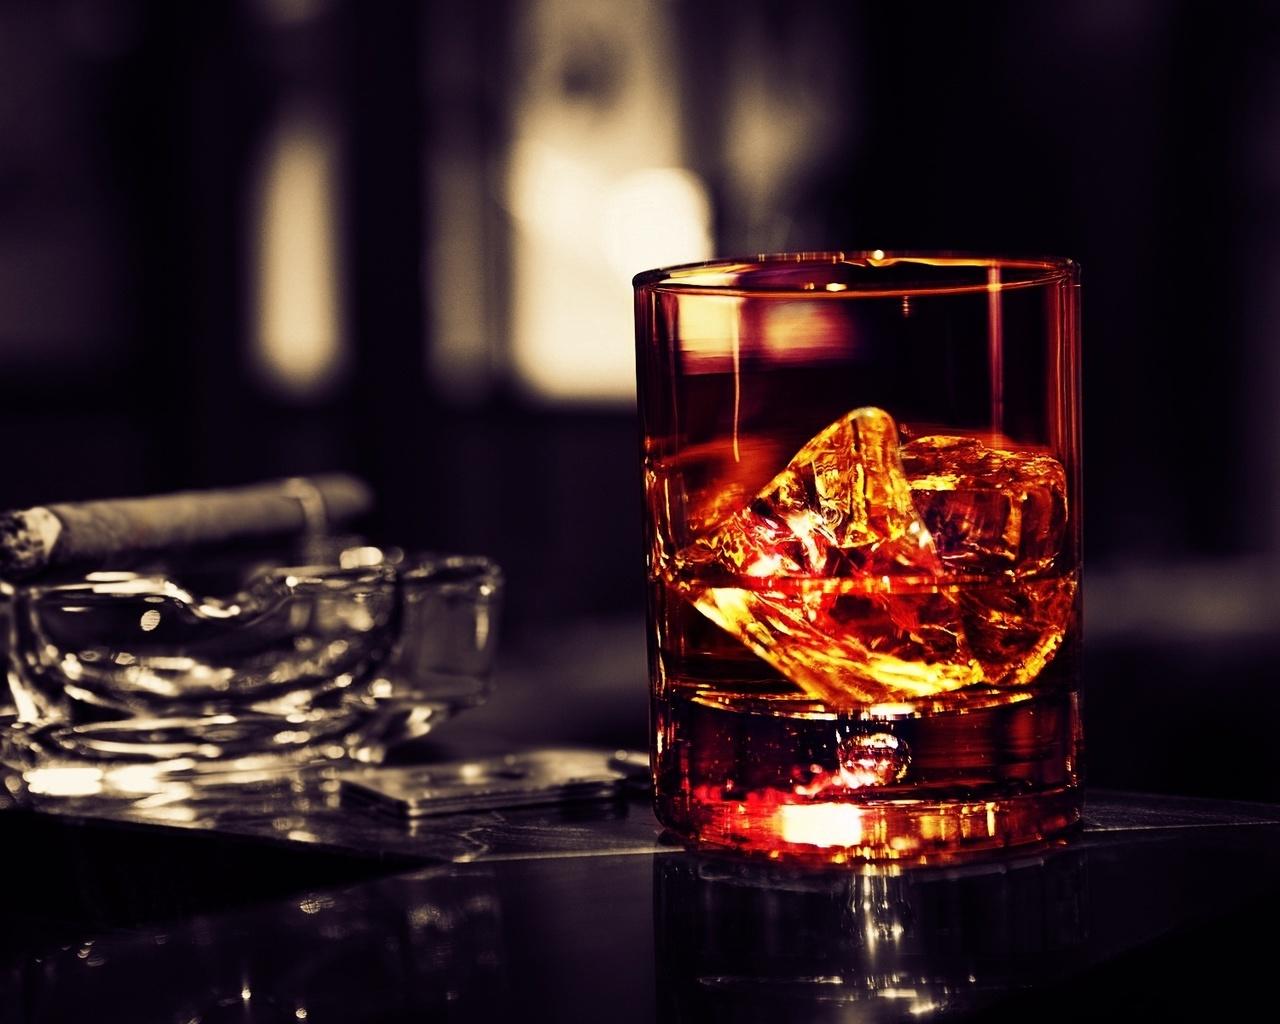 Картинки сигареты и алкоголь, картинки вконтакте картинки